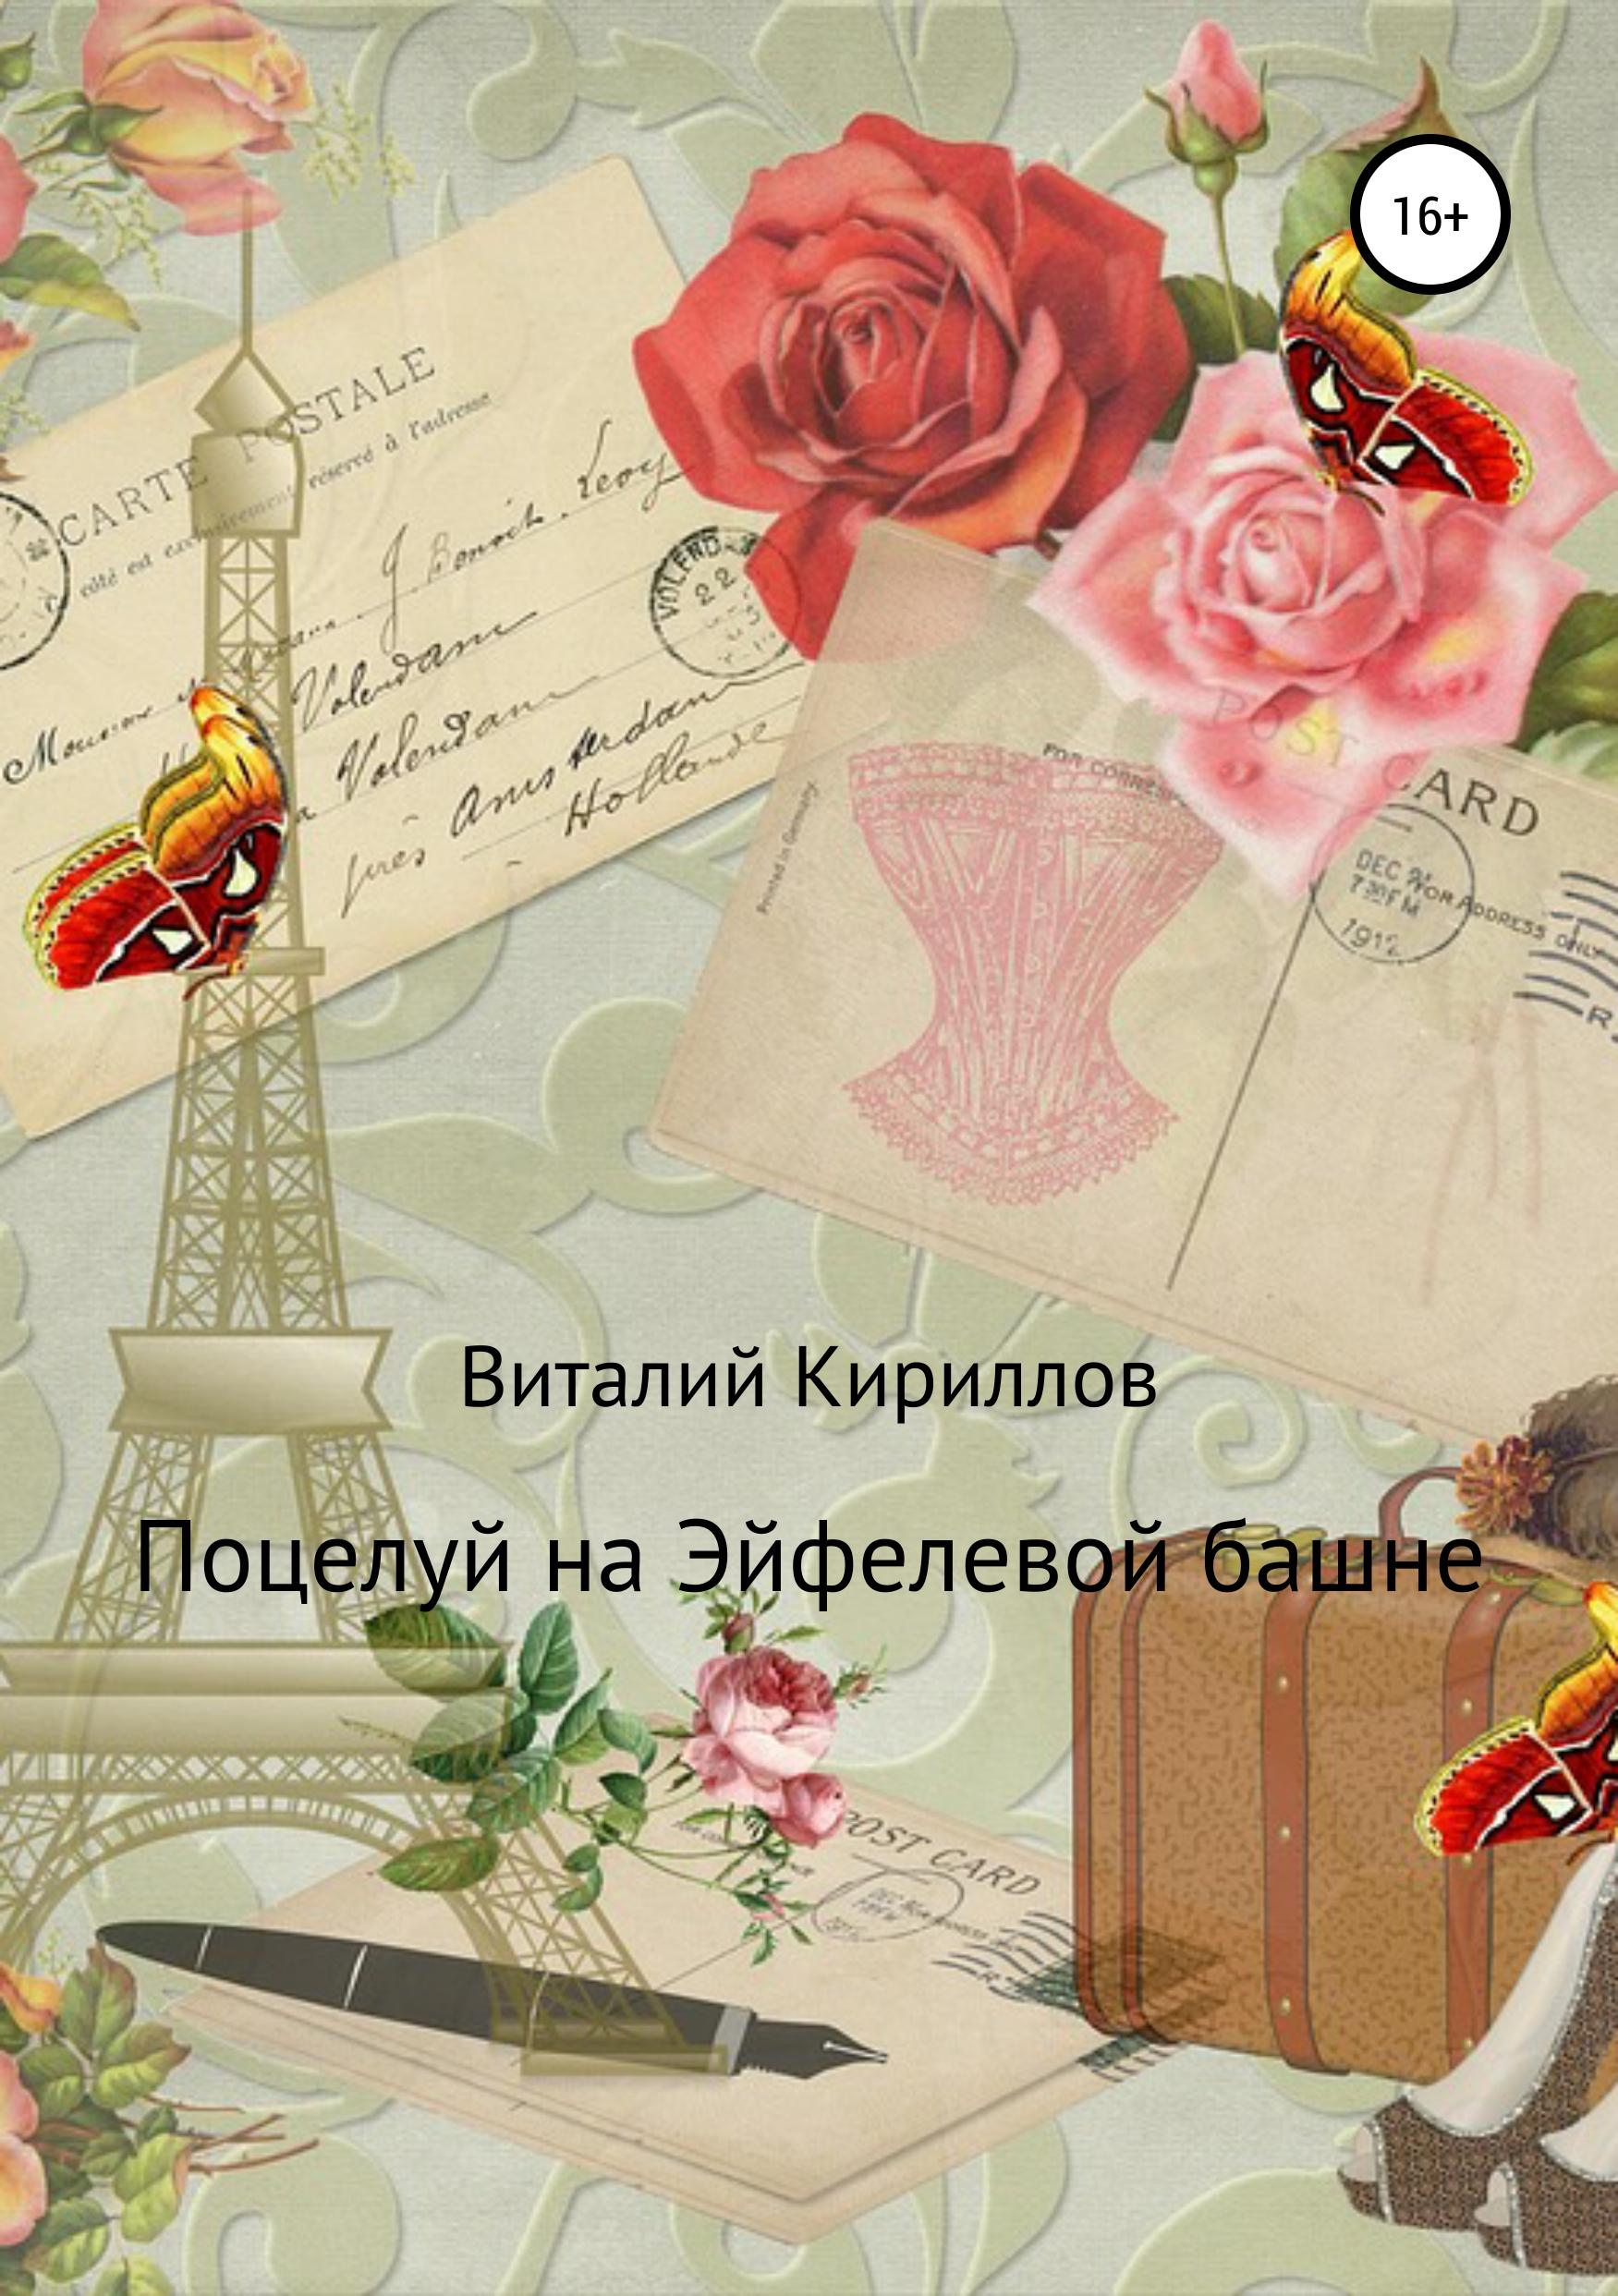 Виталий Александрович Кириллов Поцелуй на Эйфелевой башне эндрюс э поцелуй под звездным небом роман